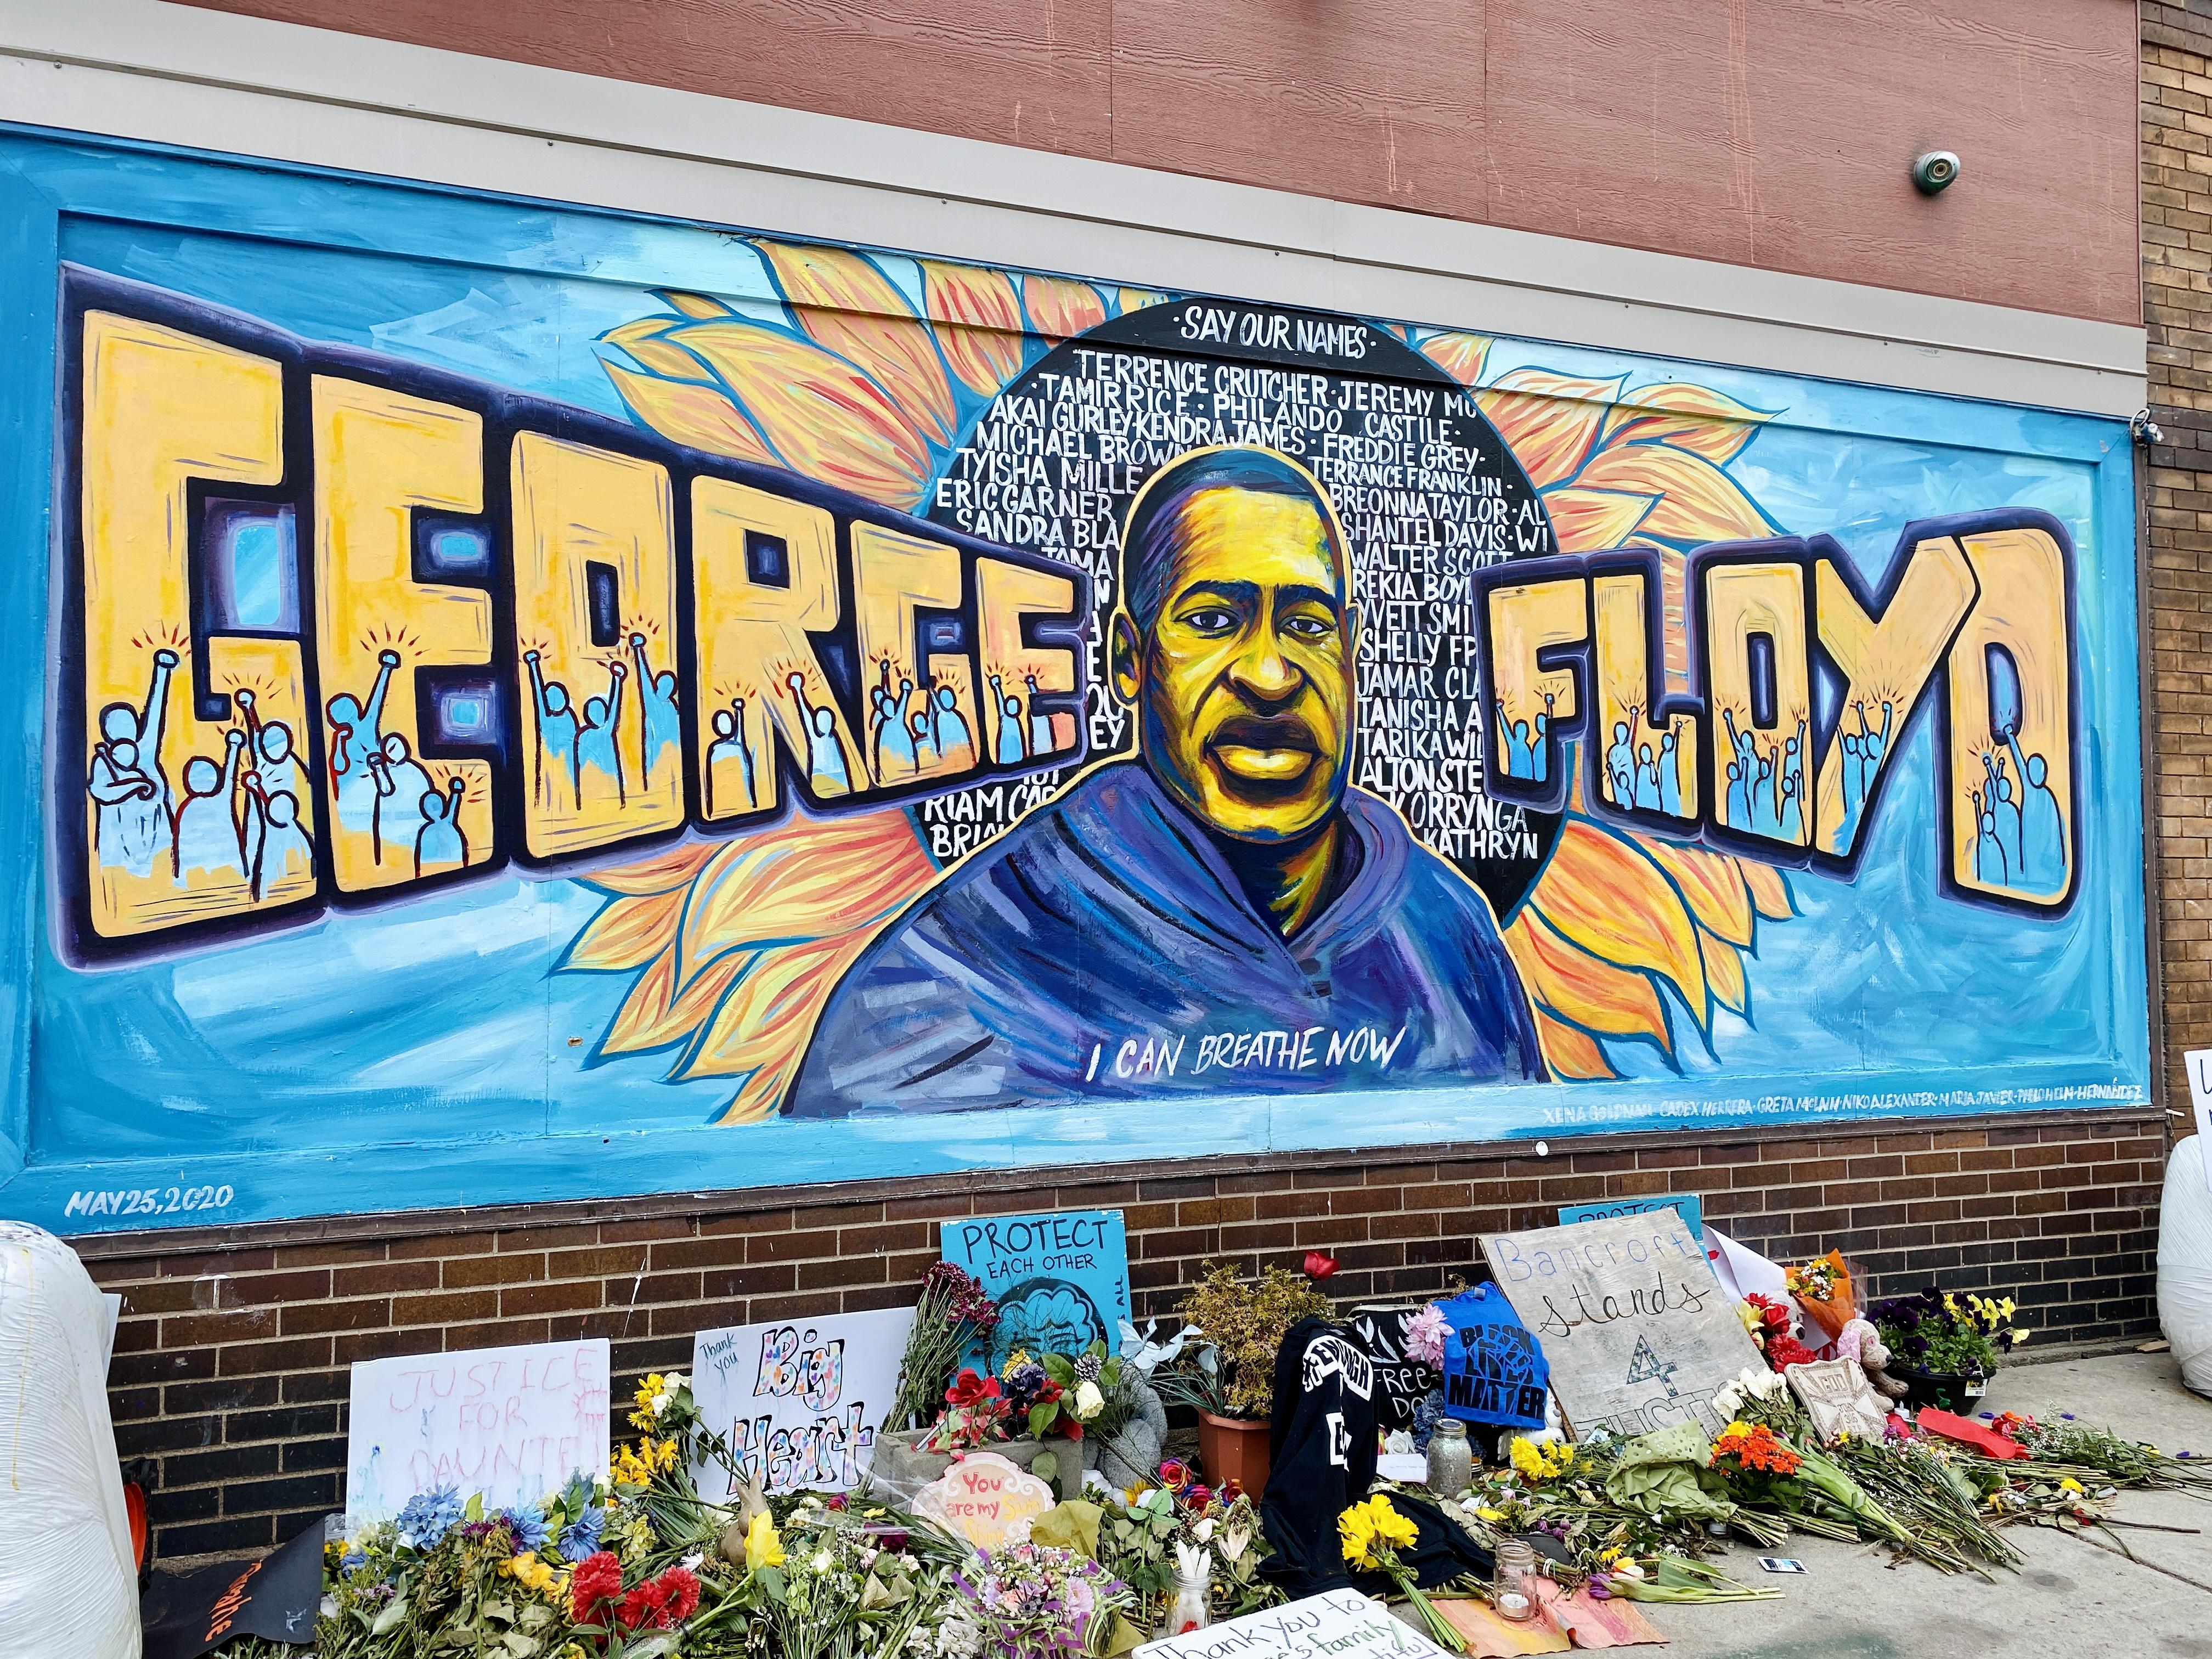 Mural of George Floyd at the memorial in Minneapolis